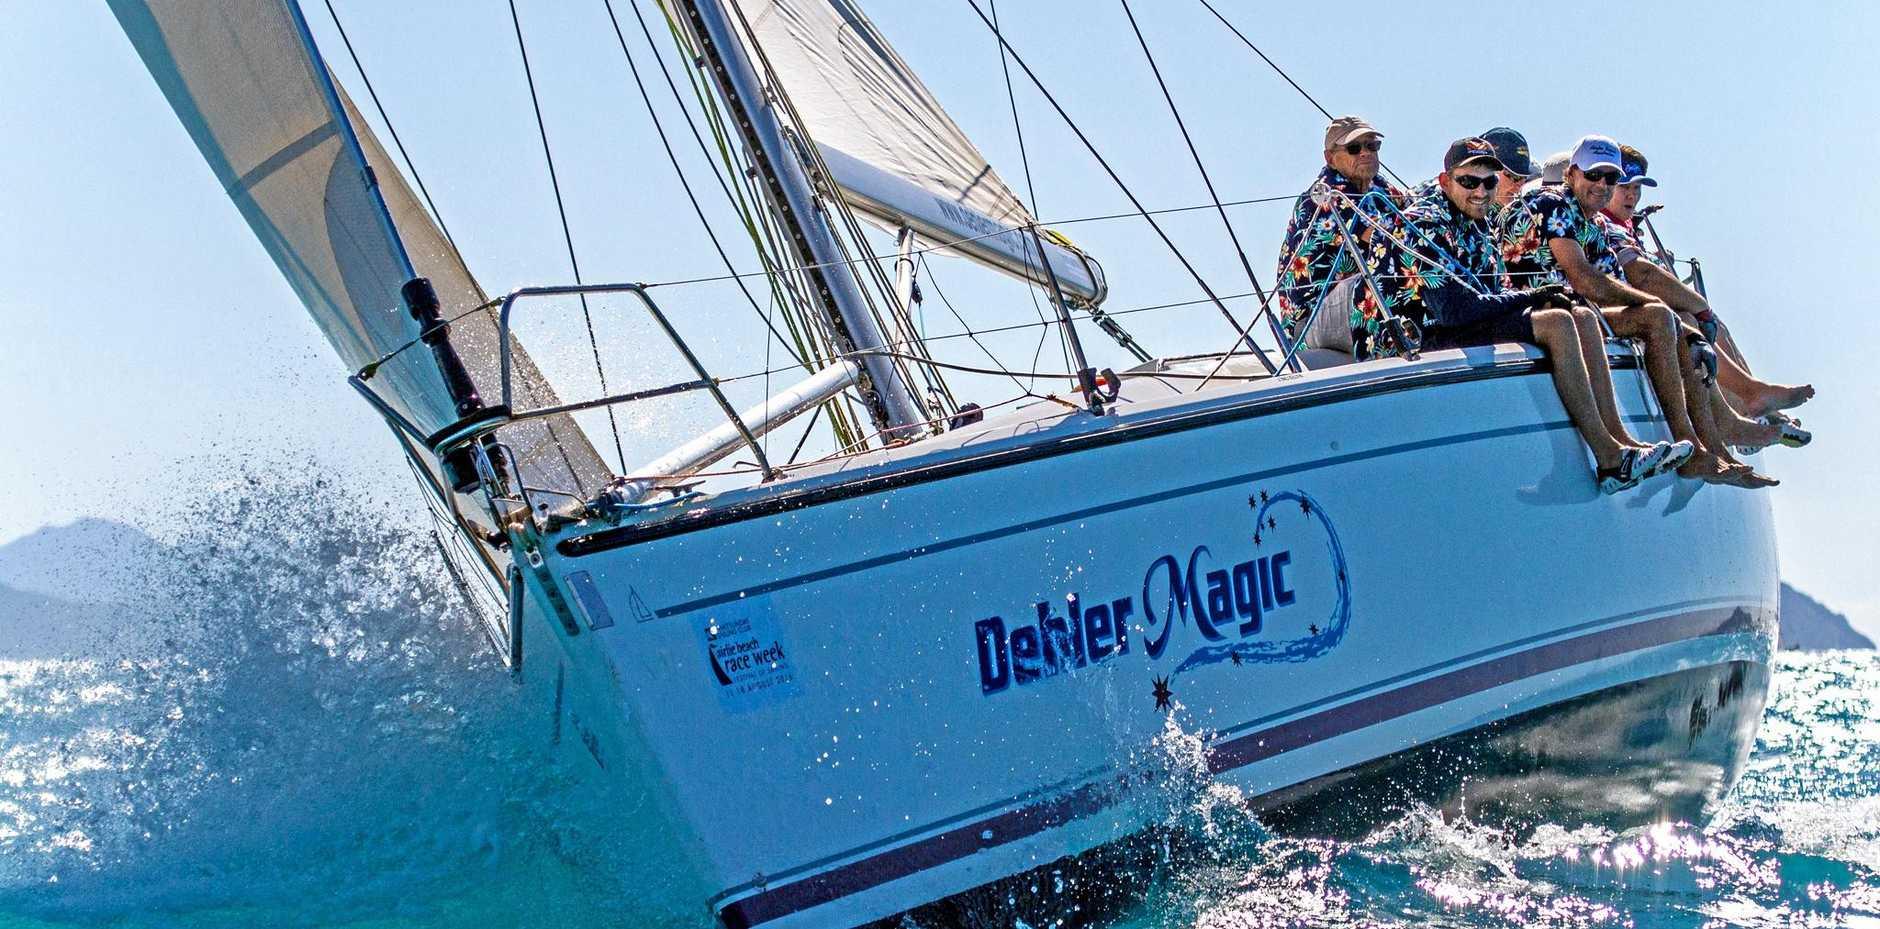 LINE HONOURS: Dehler Magic took line honours in Race 1 of the WOYRC series at the weekend.